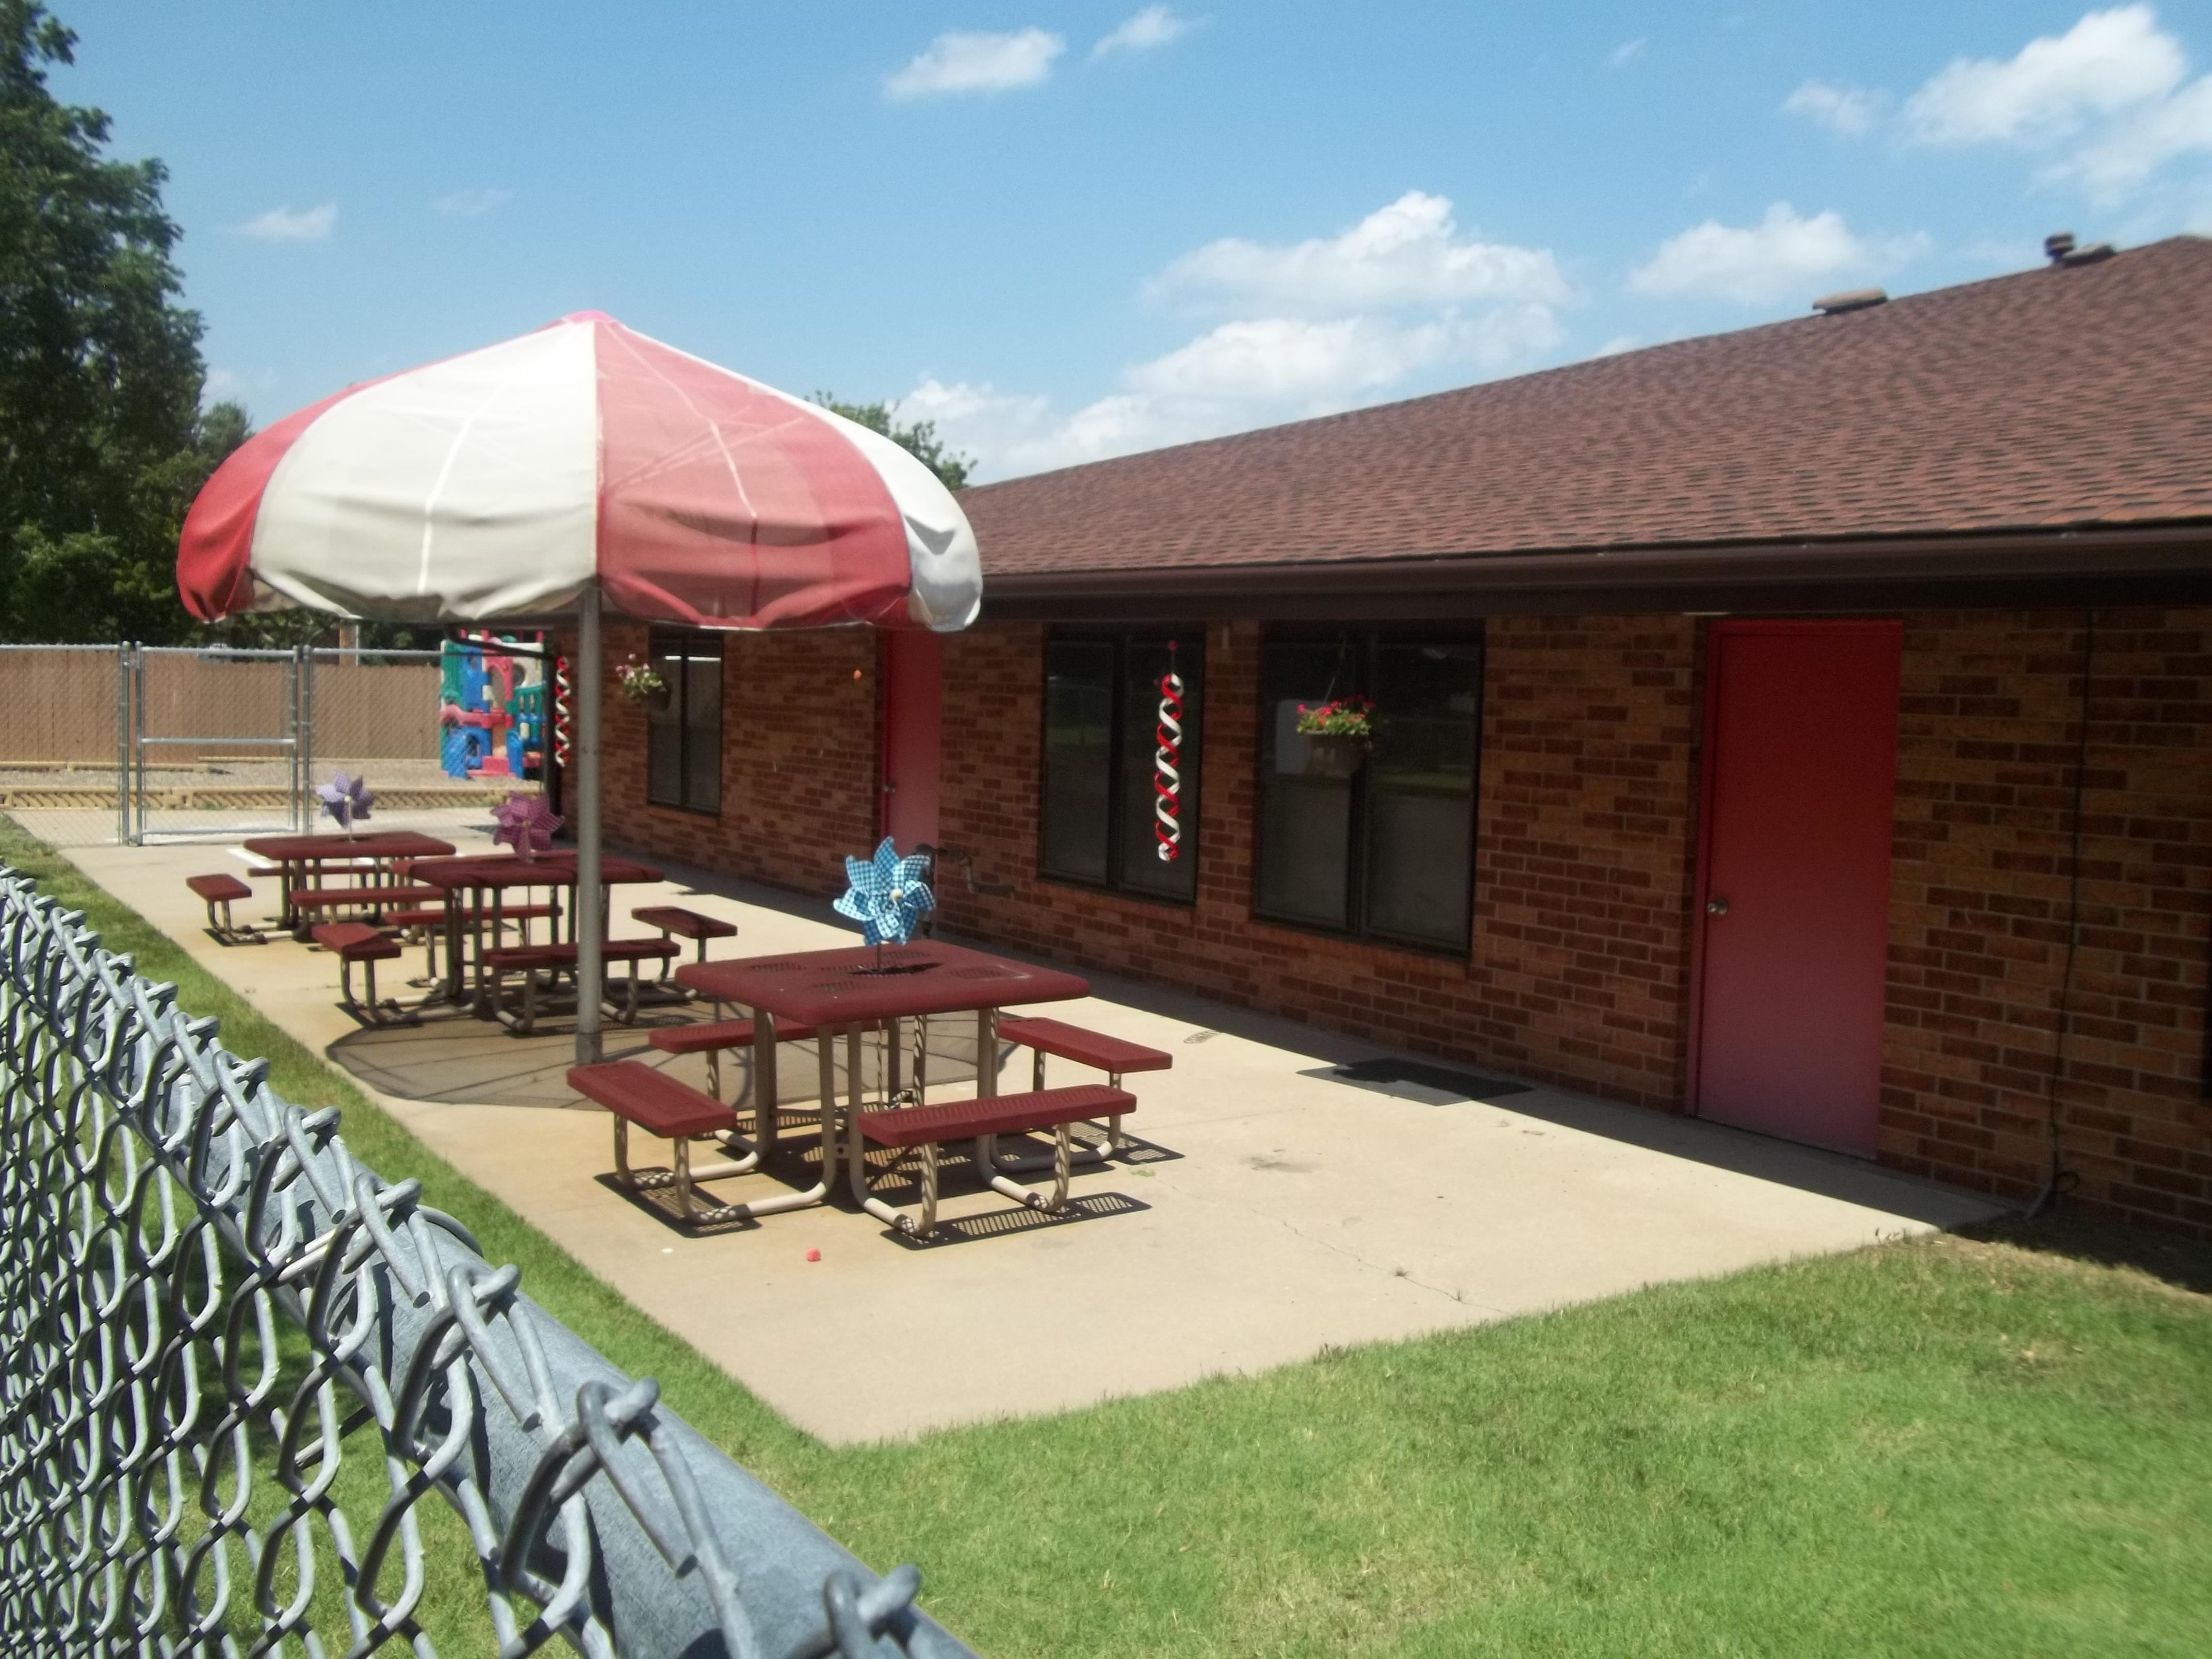 wichita preschools thurman kindercare in wichita ks 316 721 0 659